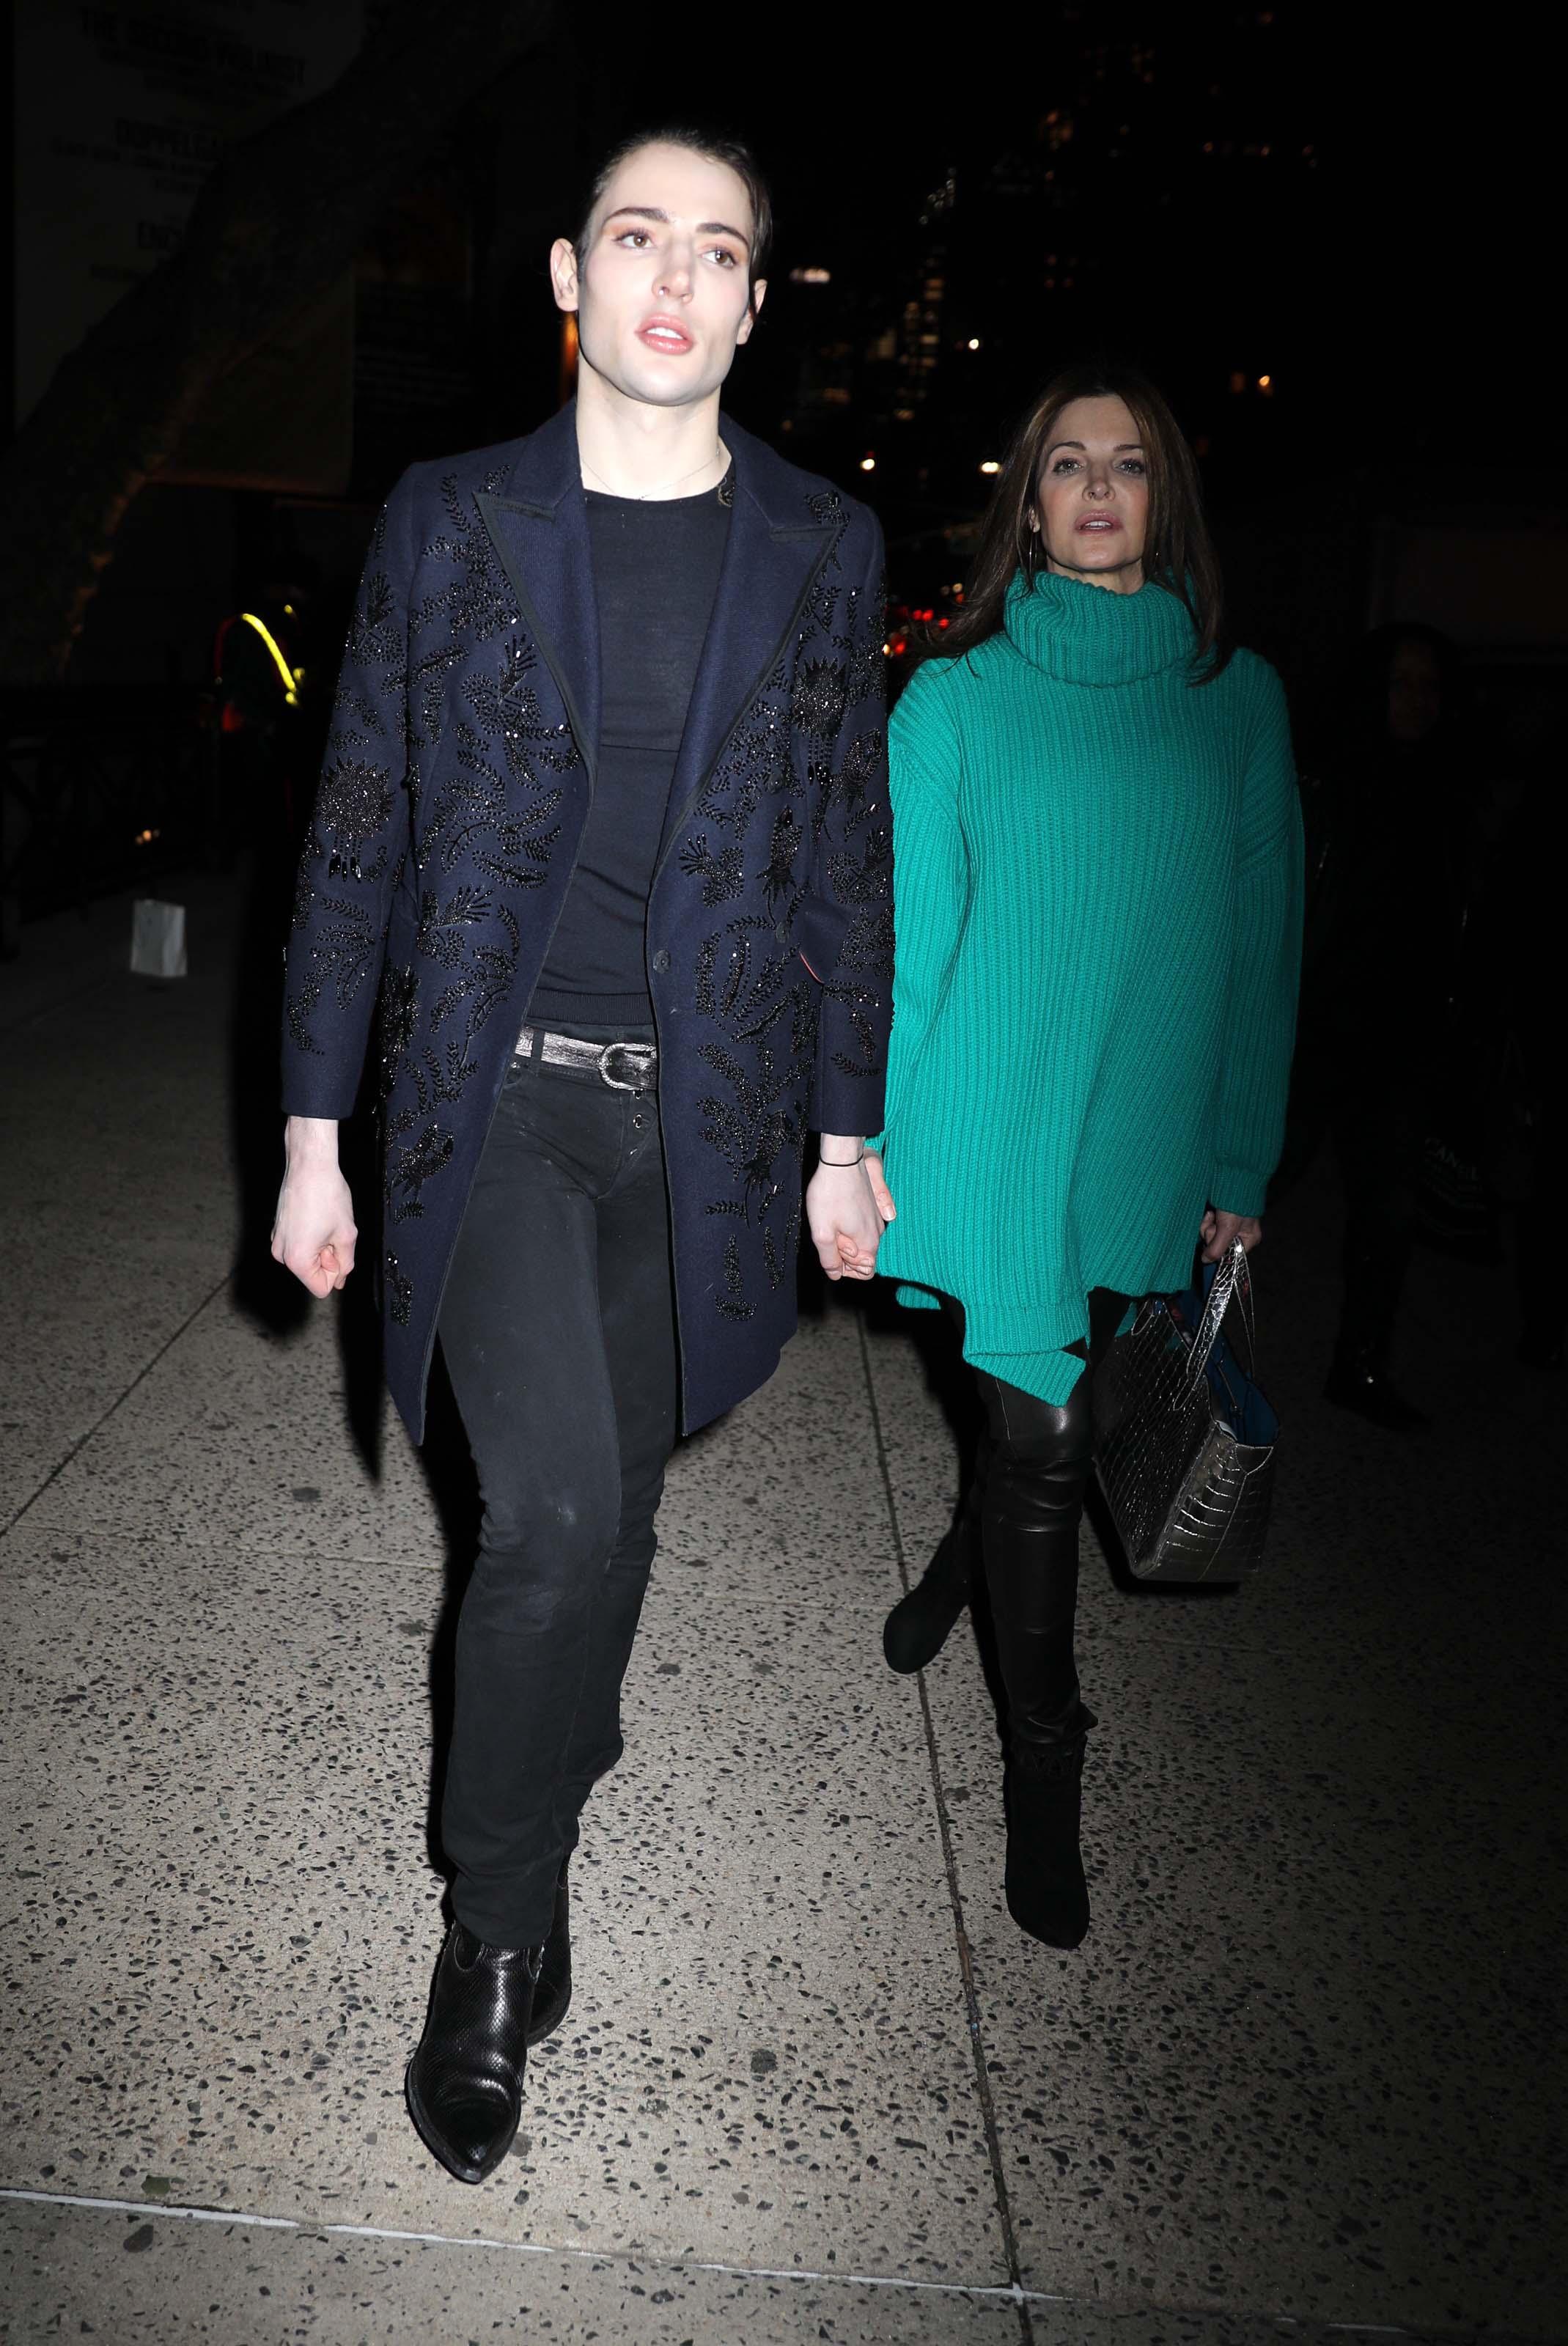 Stephanie Seymour leaving the Marc Jacobs Fashion Show